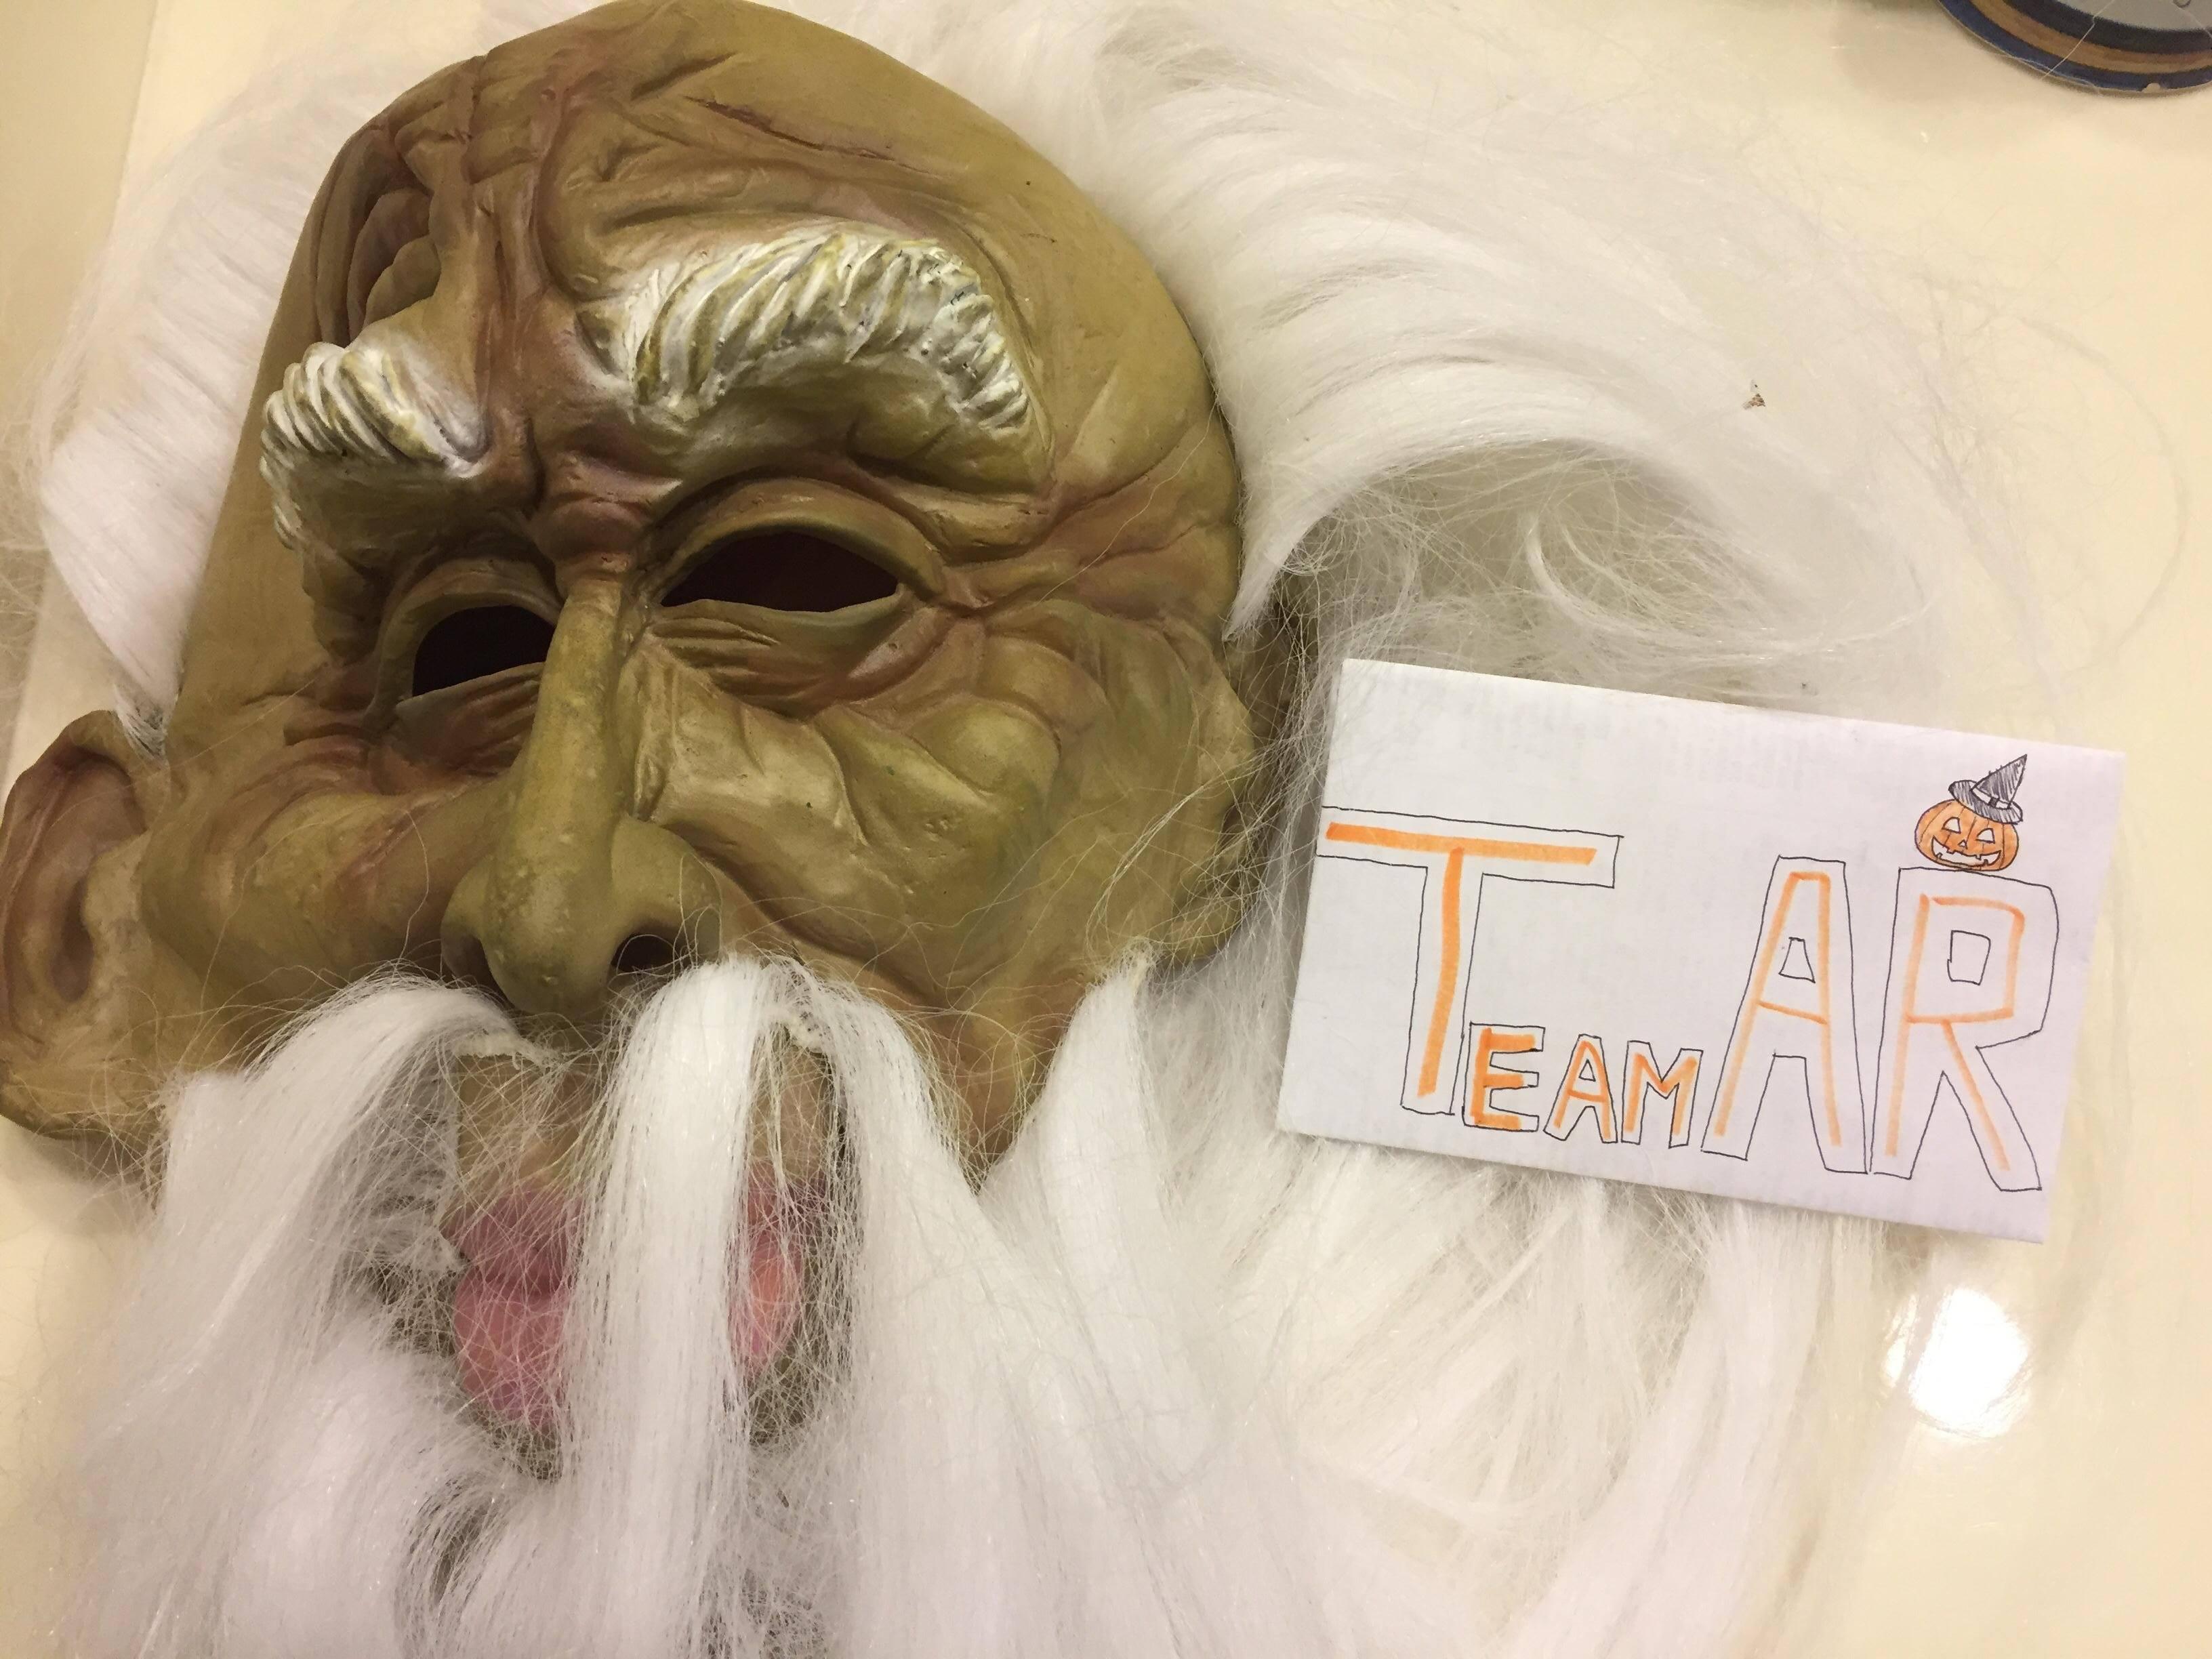 TeamAR Halloween.jpg